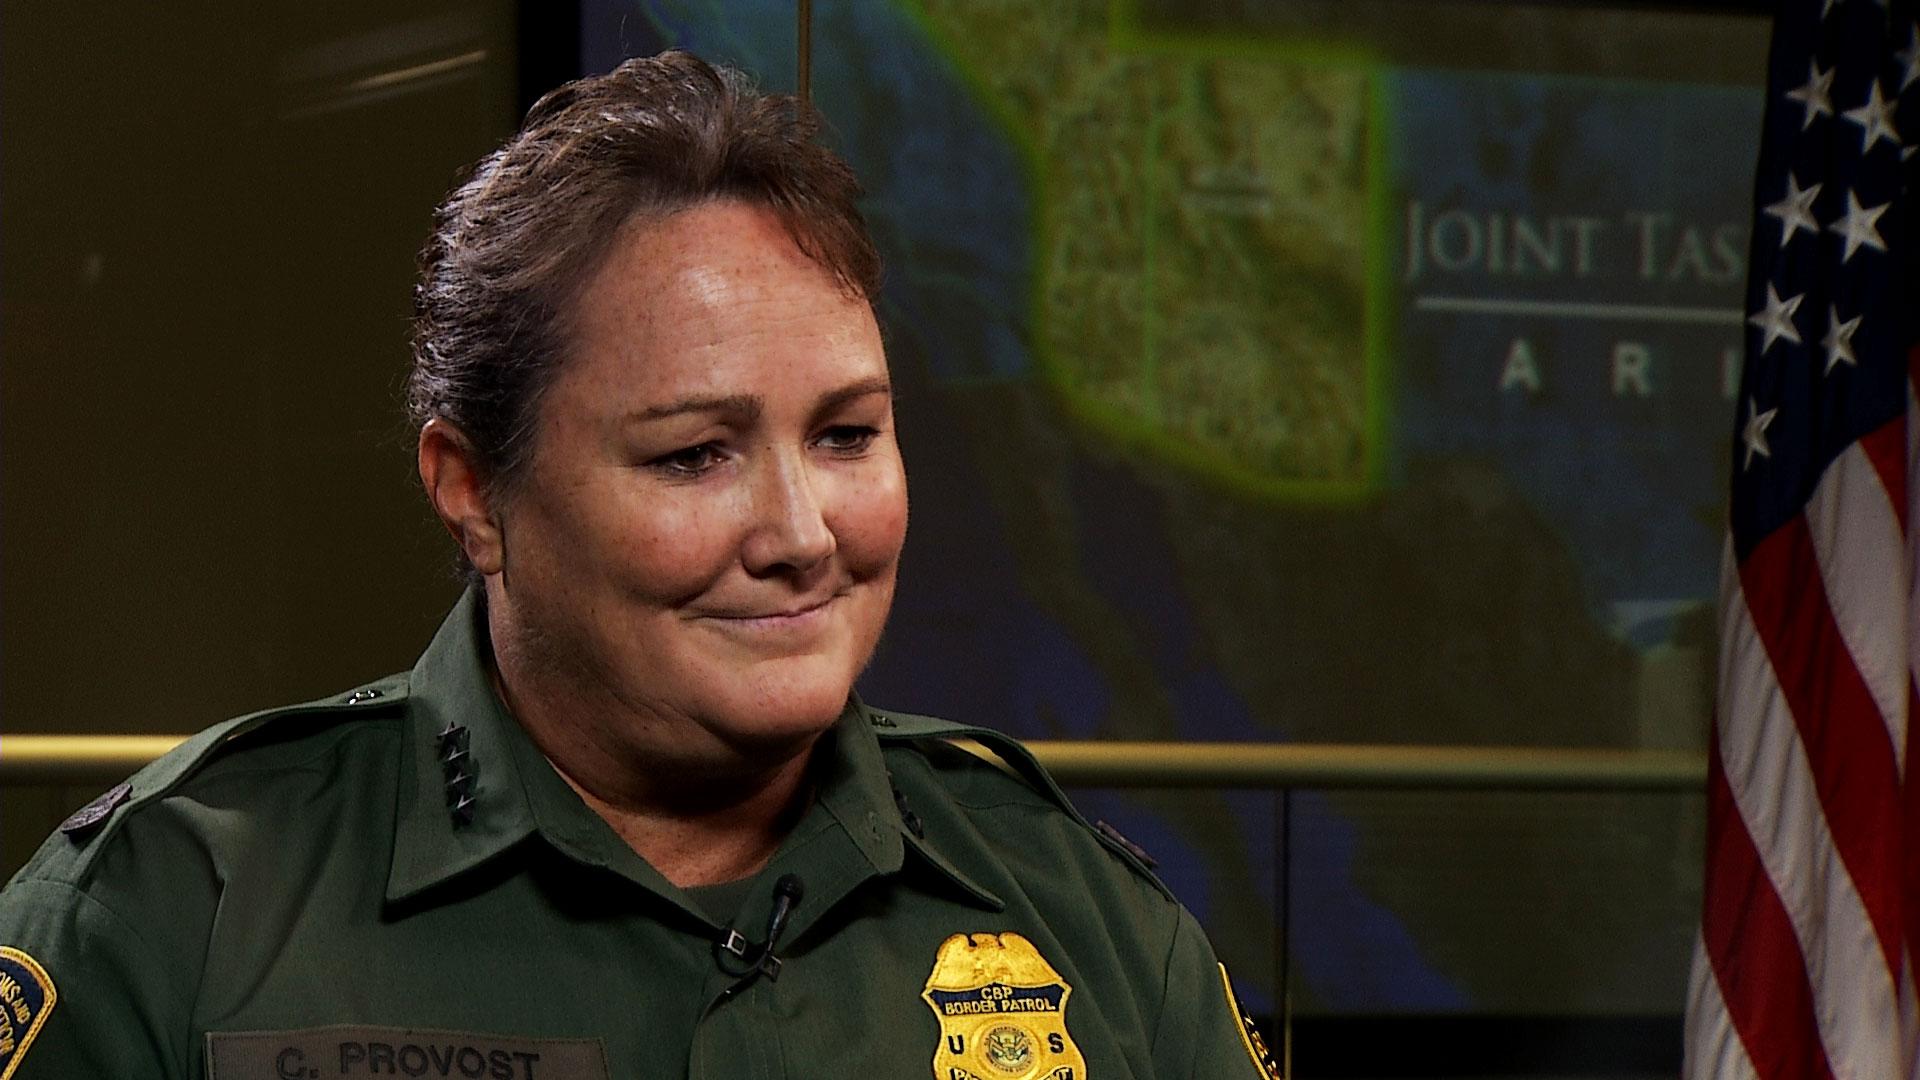 U.S. Border Patrol Chief Carla Provost.